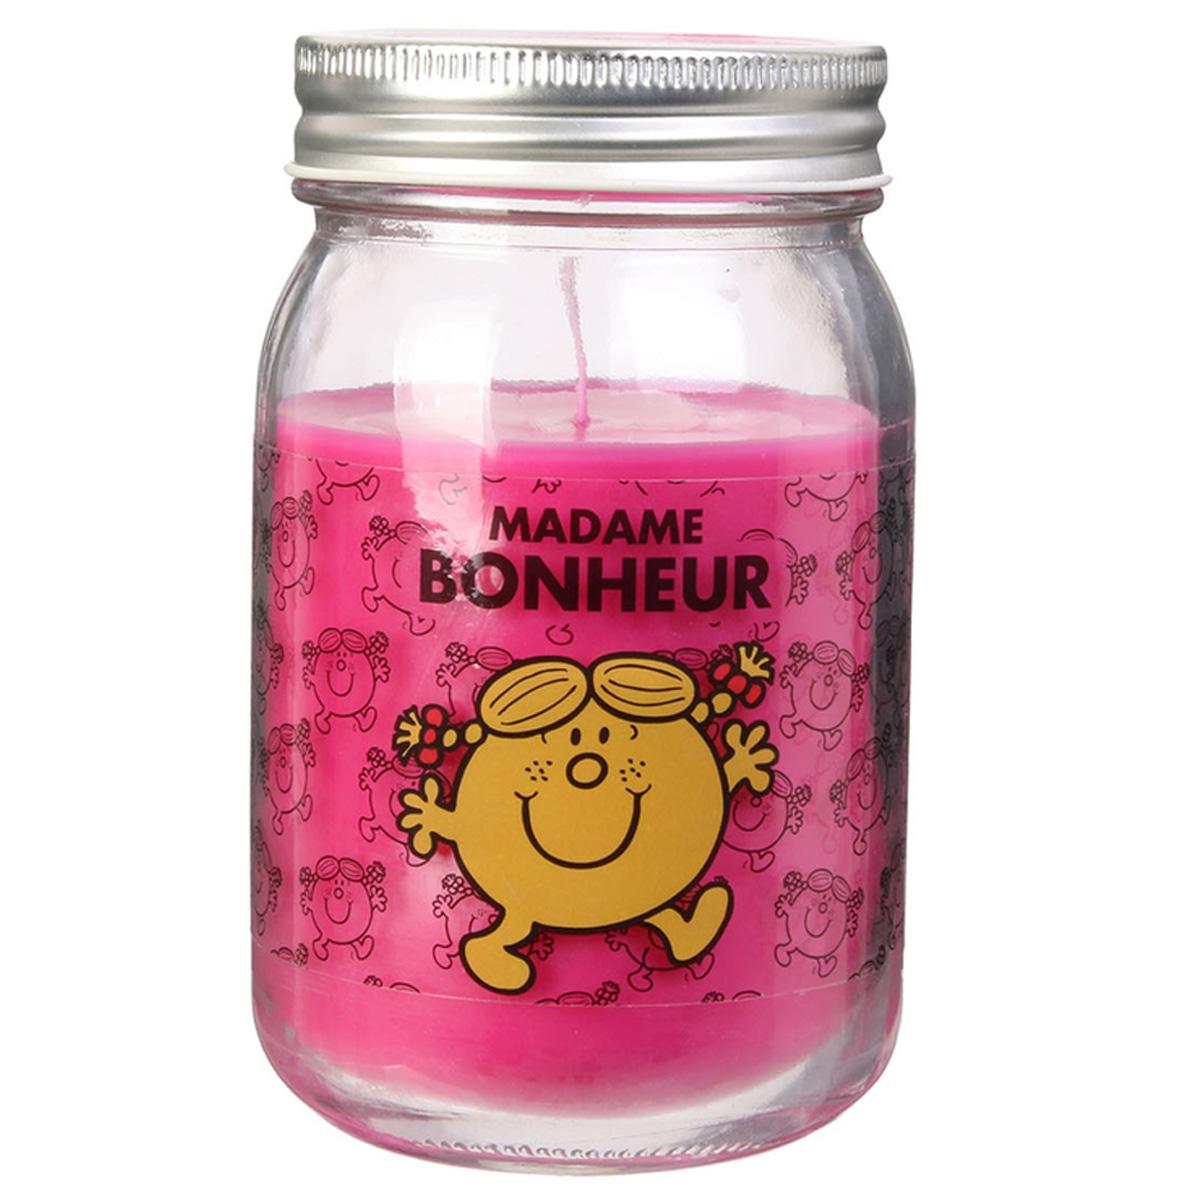 Bougie parfumée mason jar \'Monsieur Madame\' rose (Mme Bonheur) - 13x75 cm - [R0297]